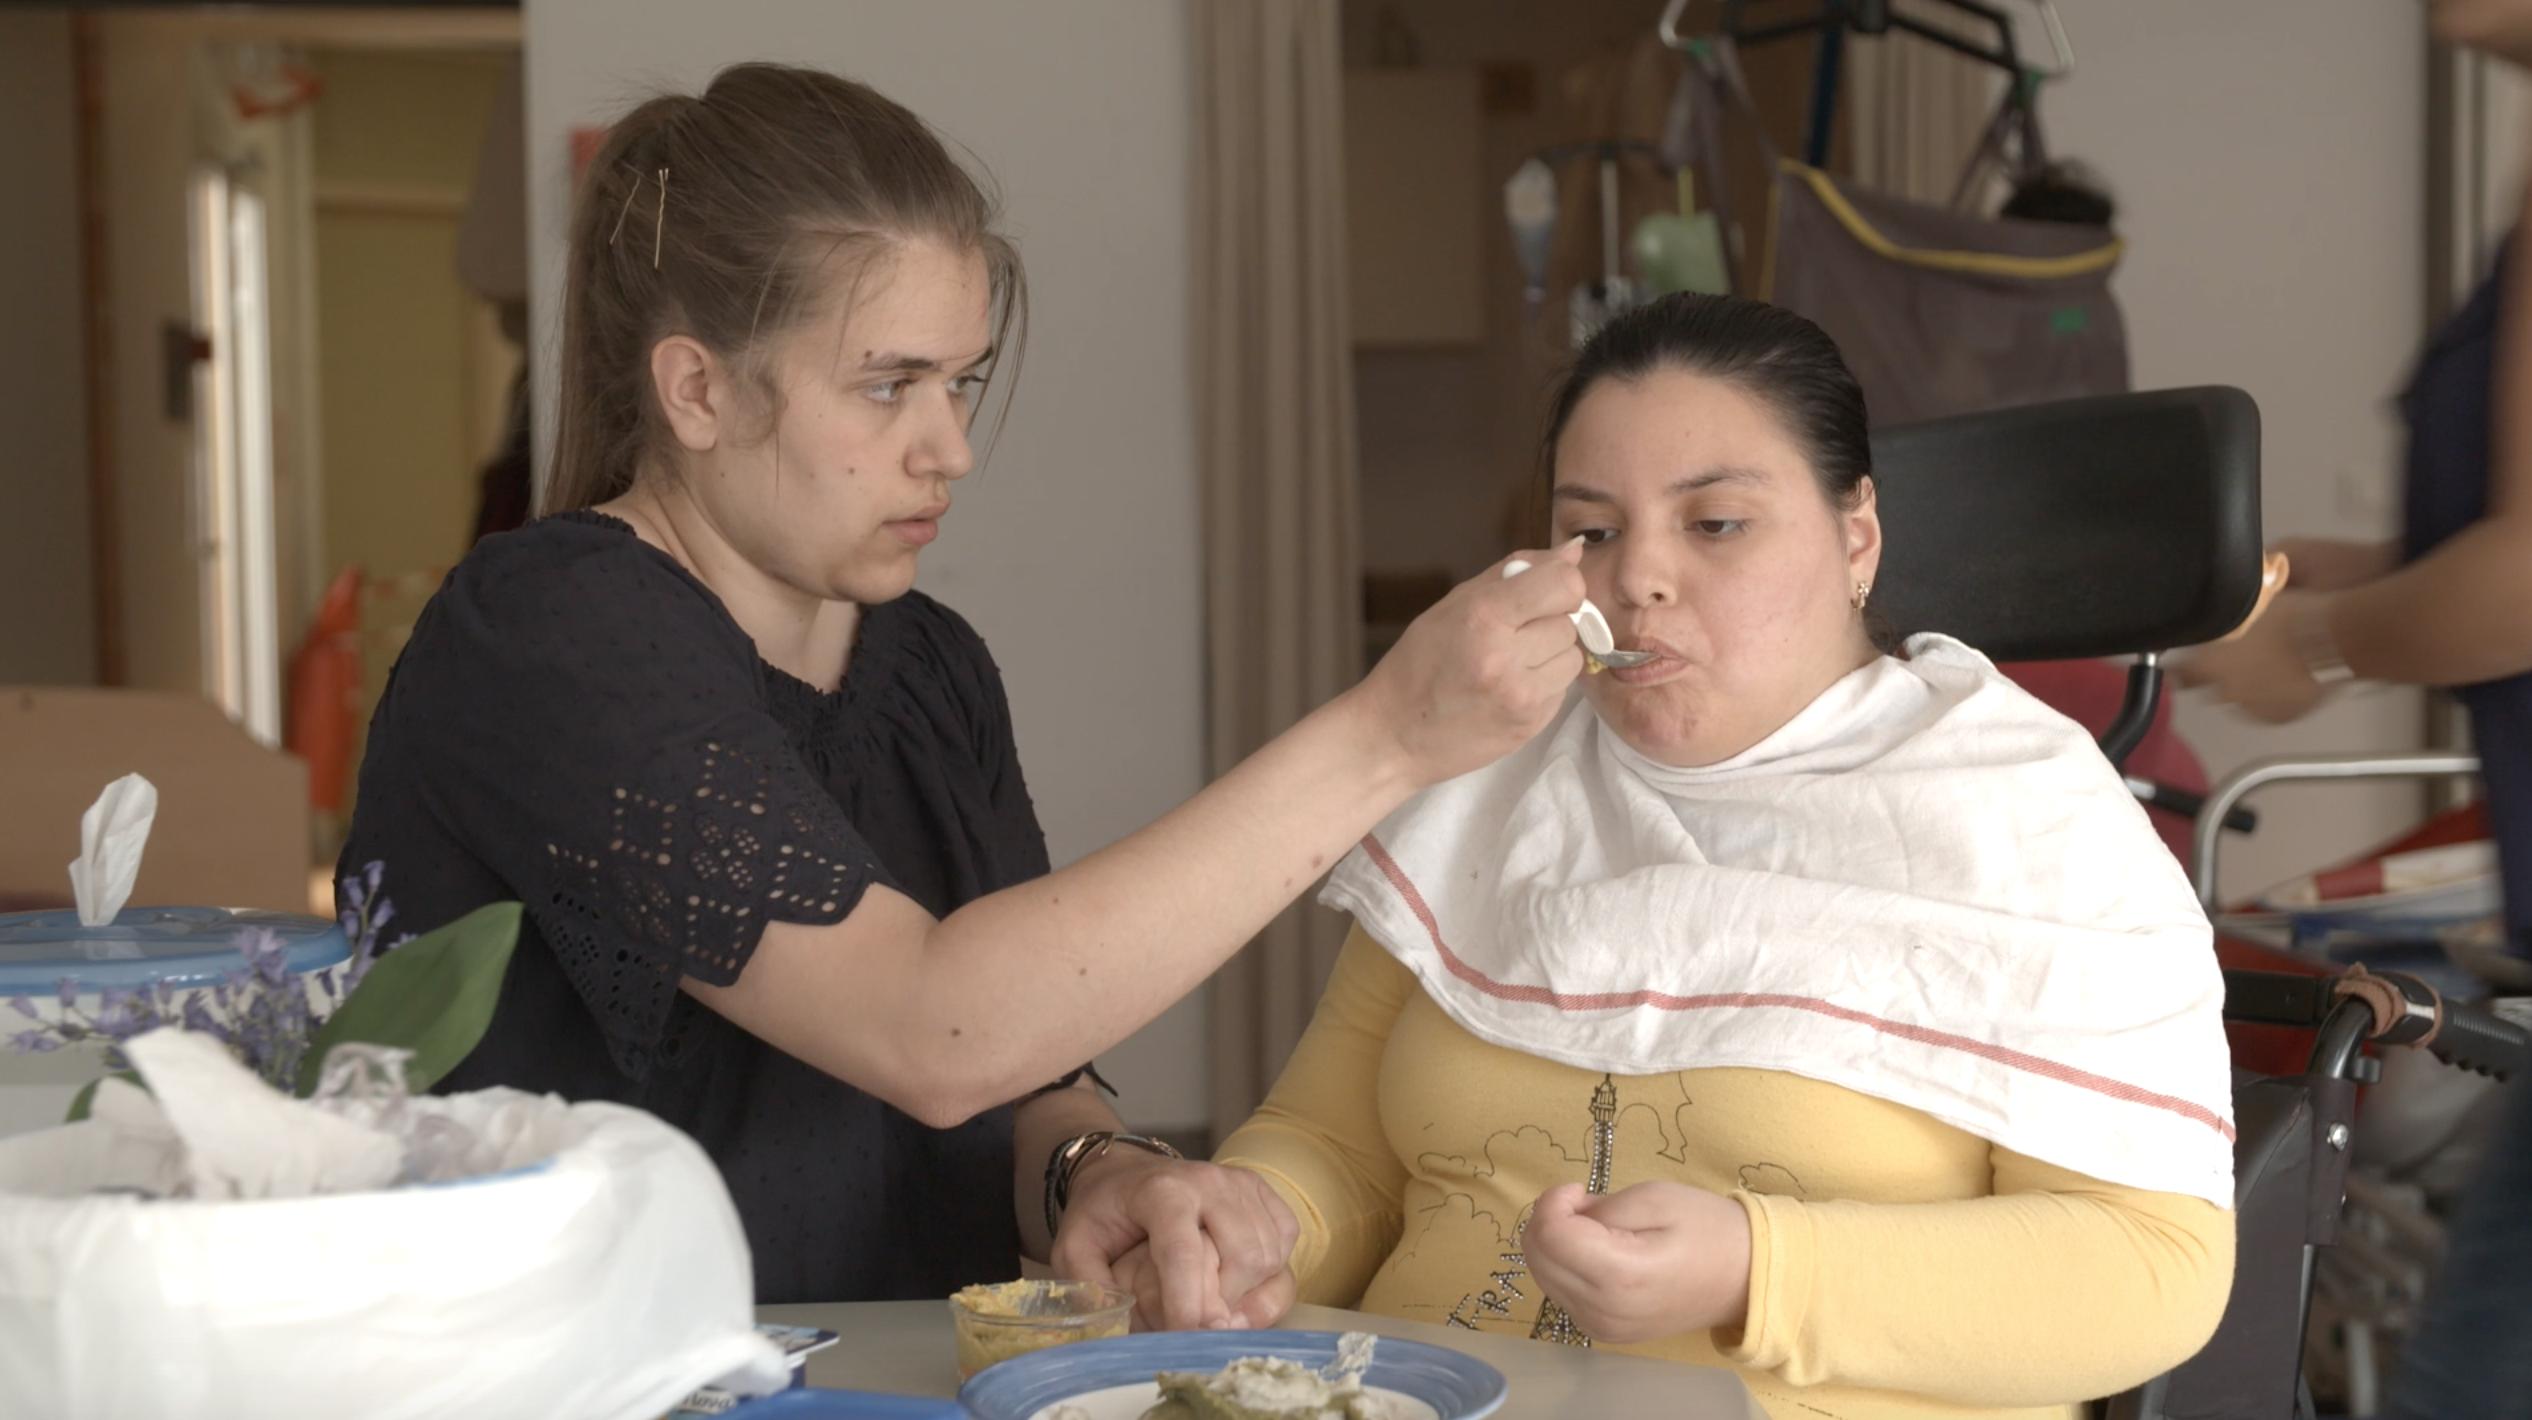 ajustement quotidien adaptation alimentation repas texture handicap